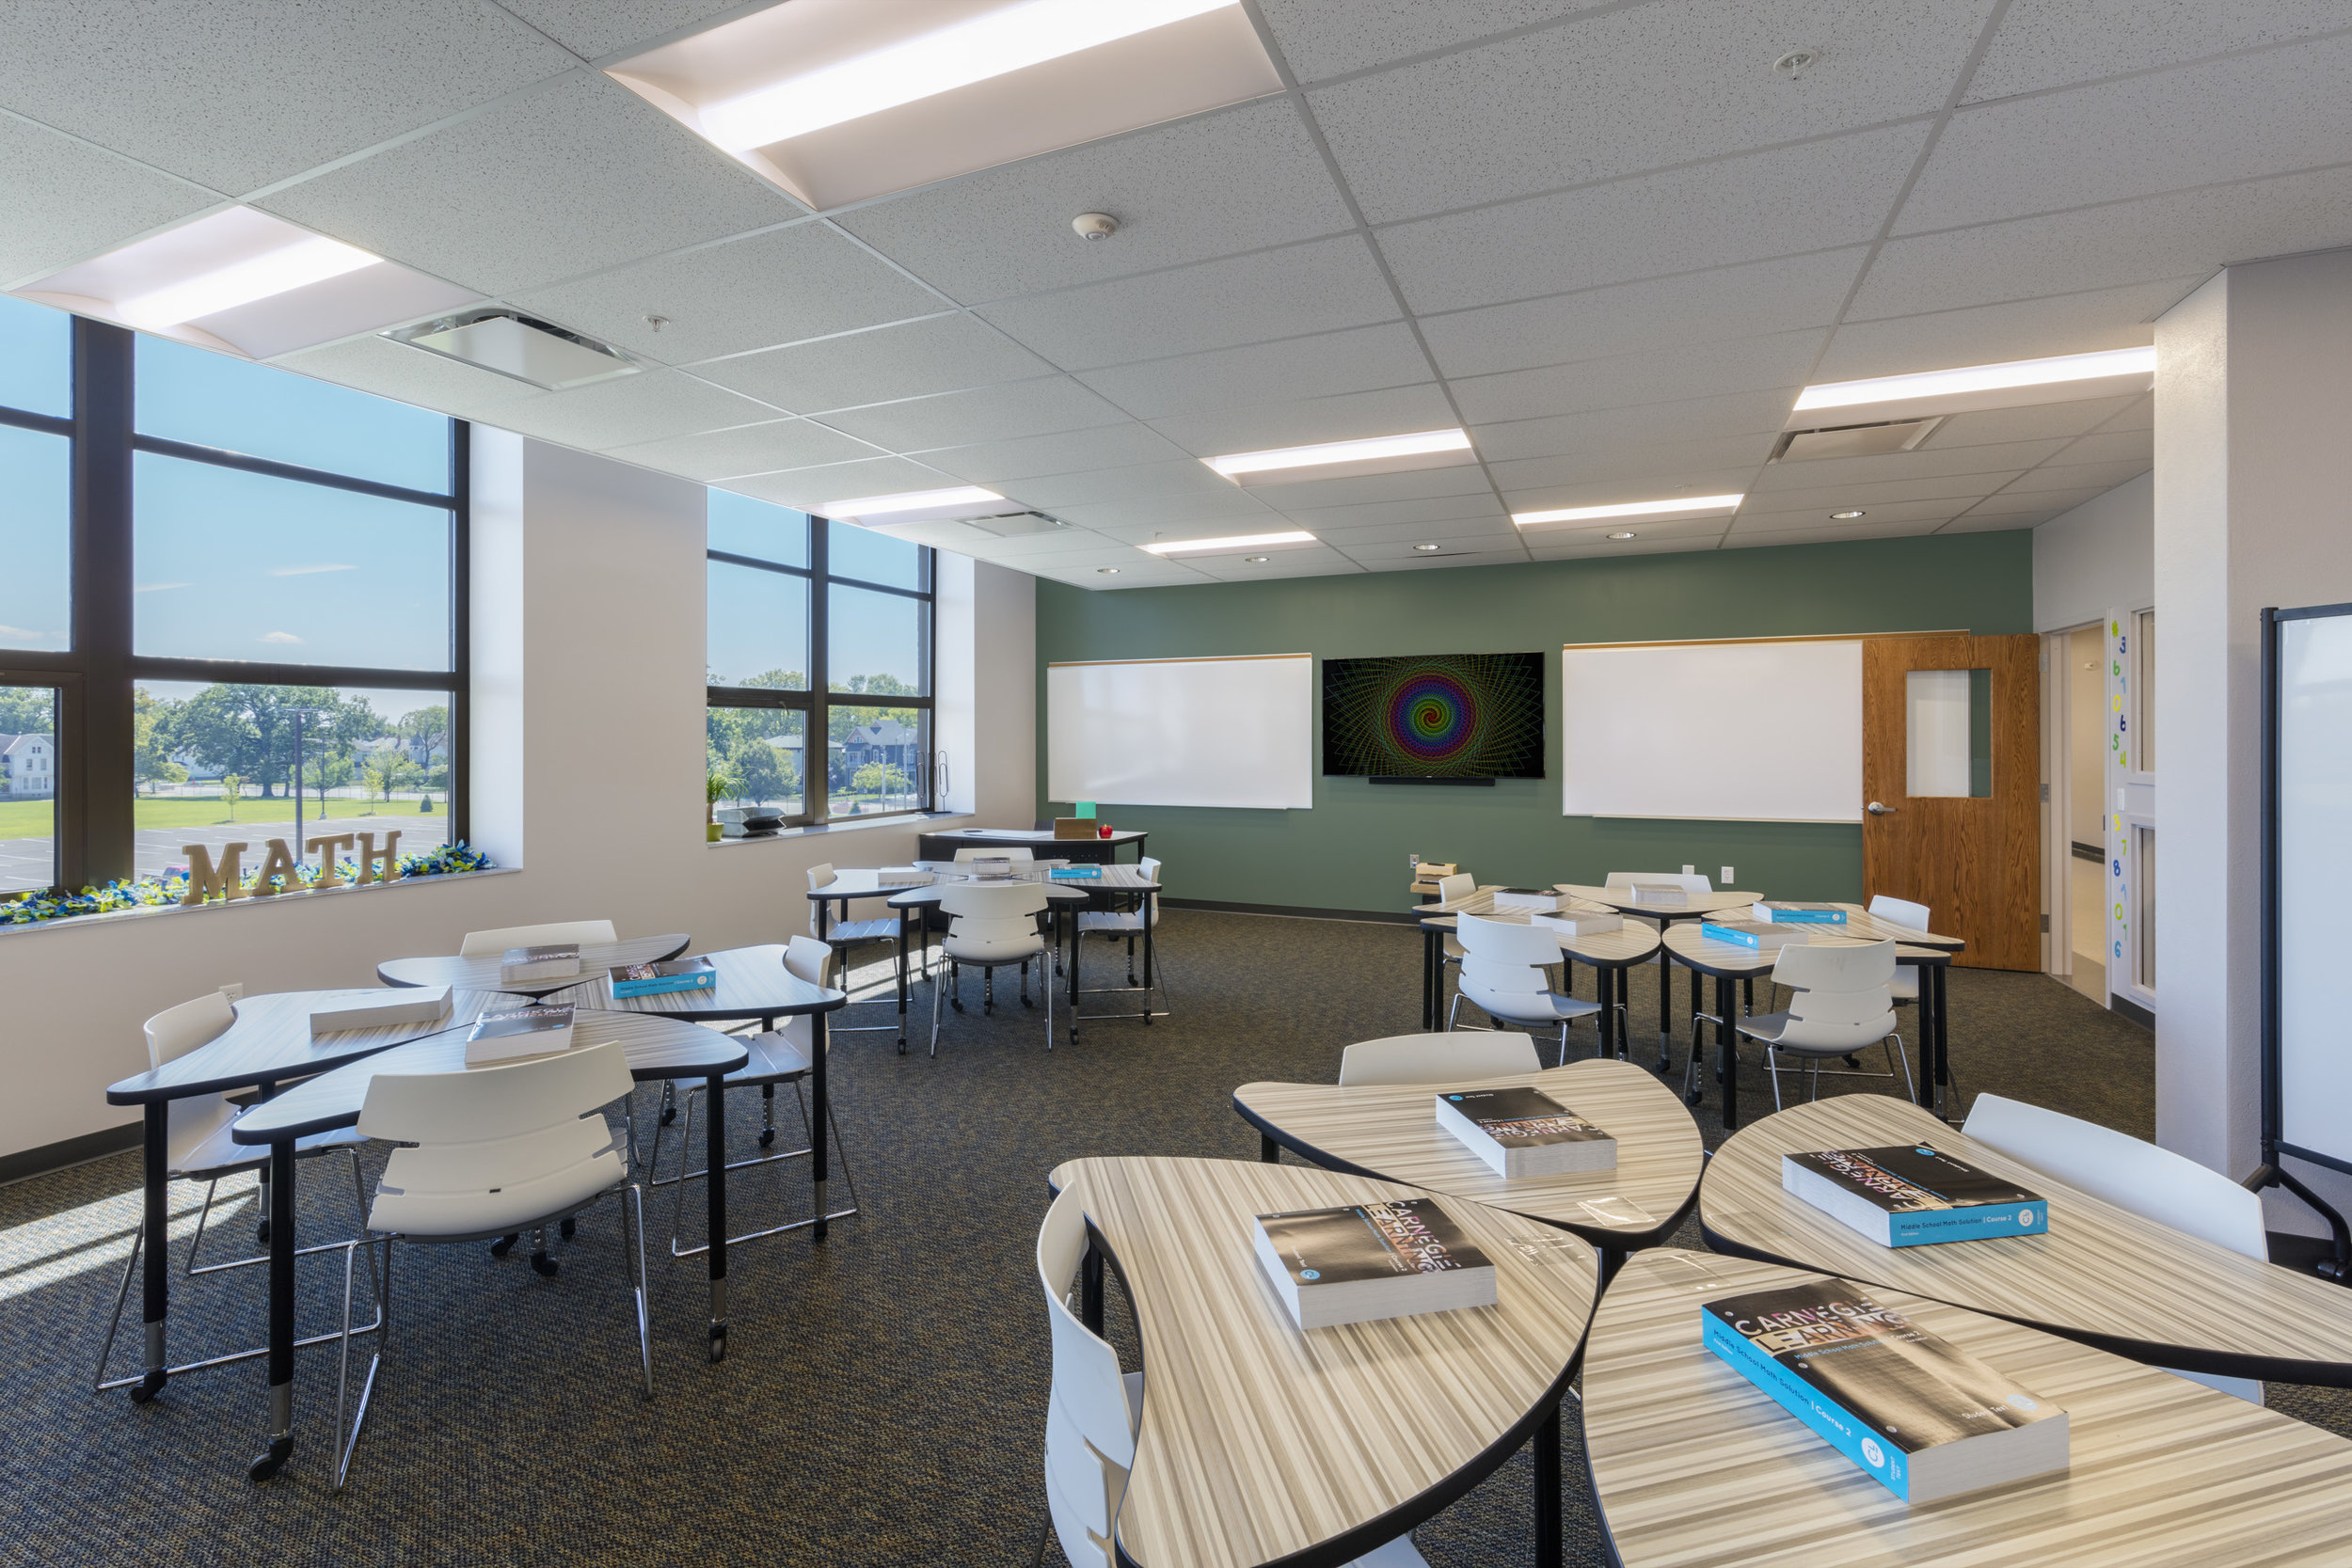 GISA Interior 3rd Floor Classroom Two.jpg